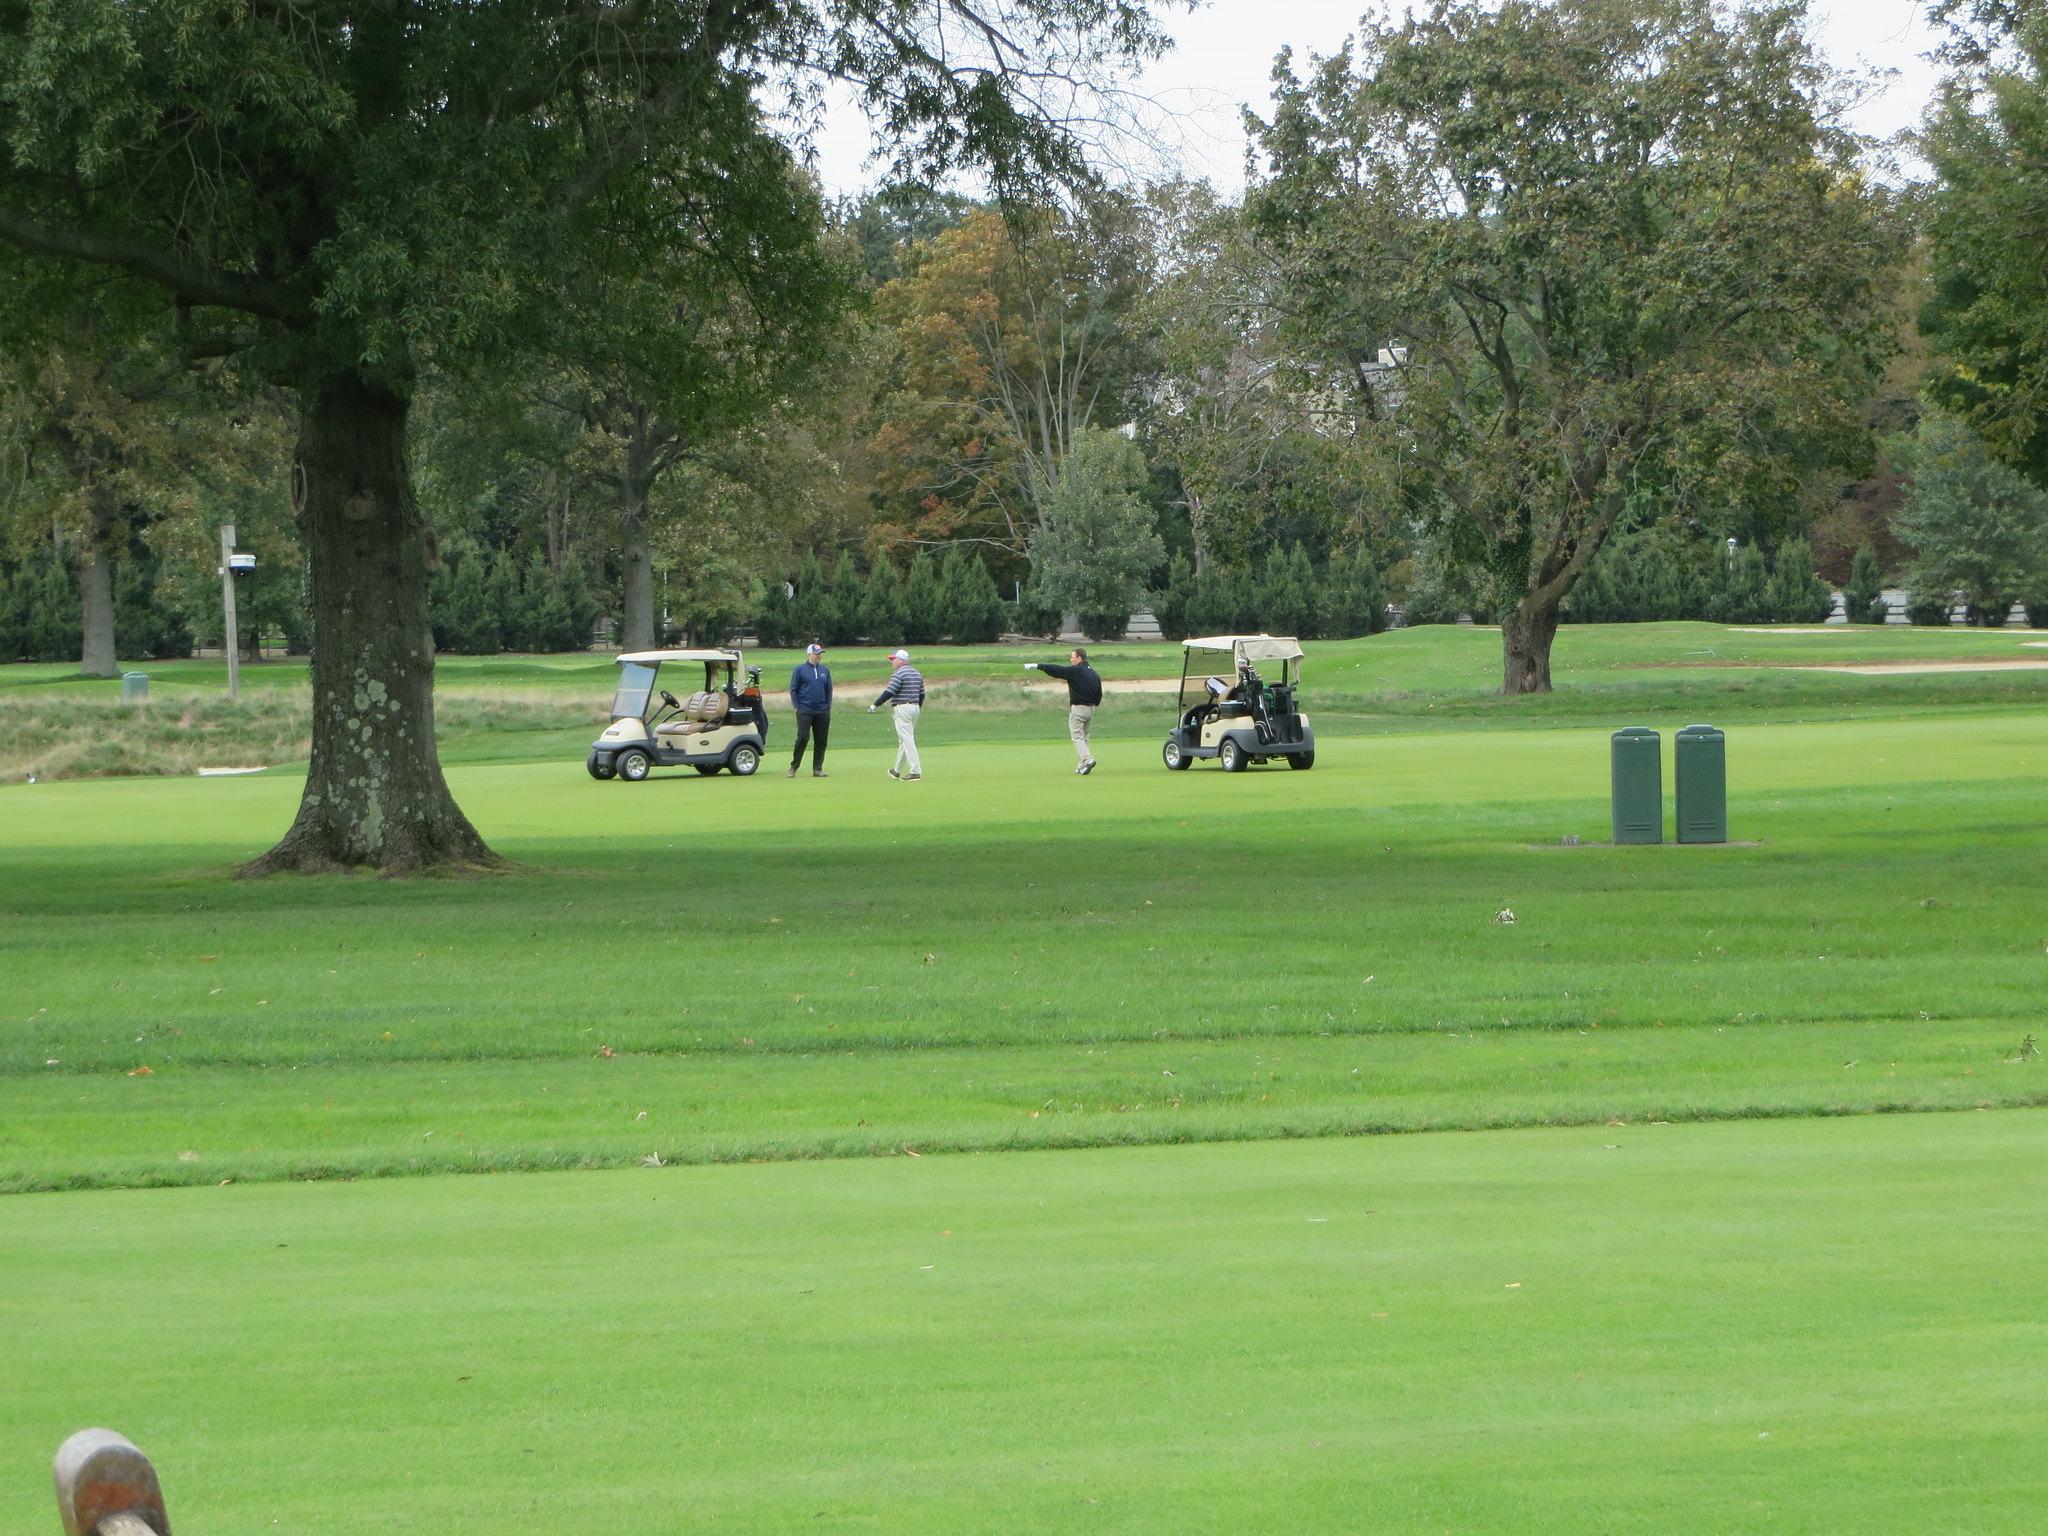 NFL Veterans to Play in John Reid Memorial Golf Classic on Oct. 7th